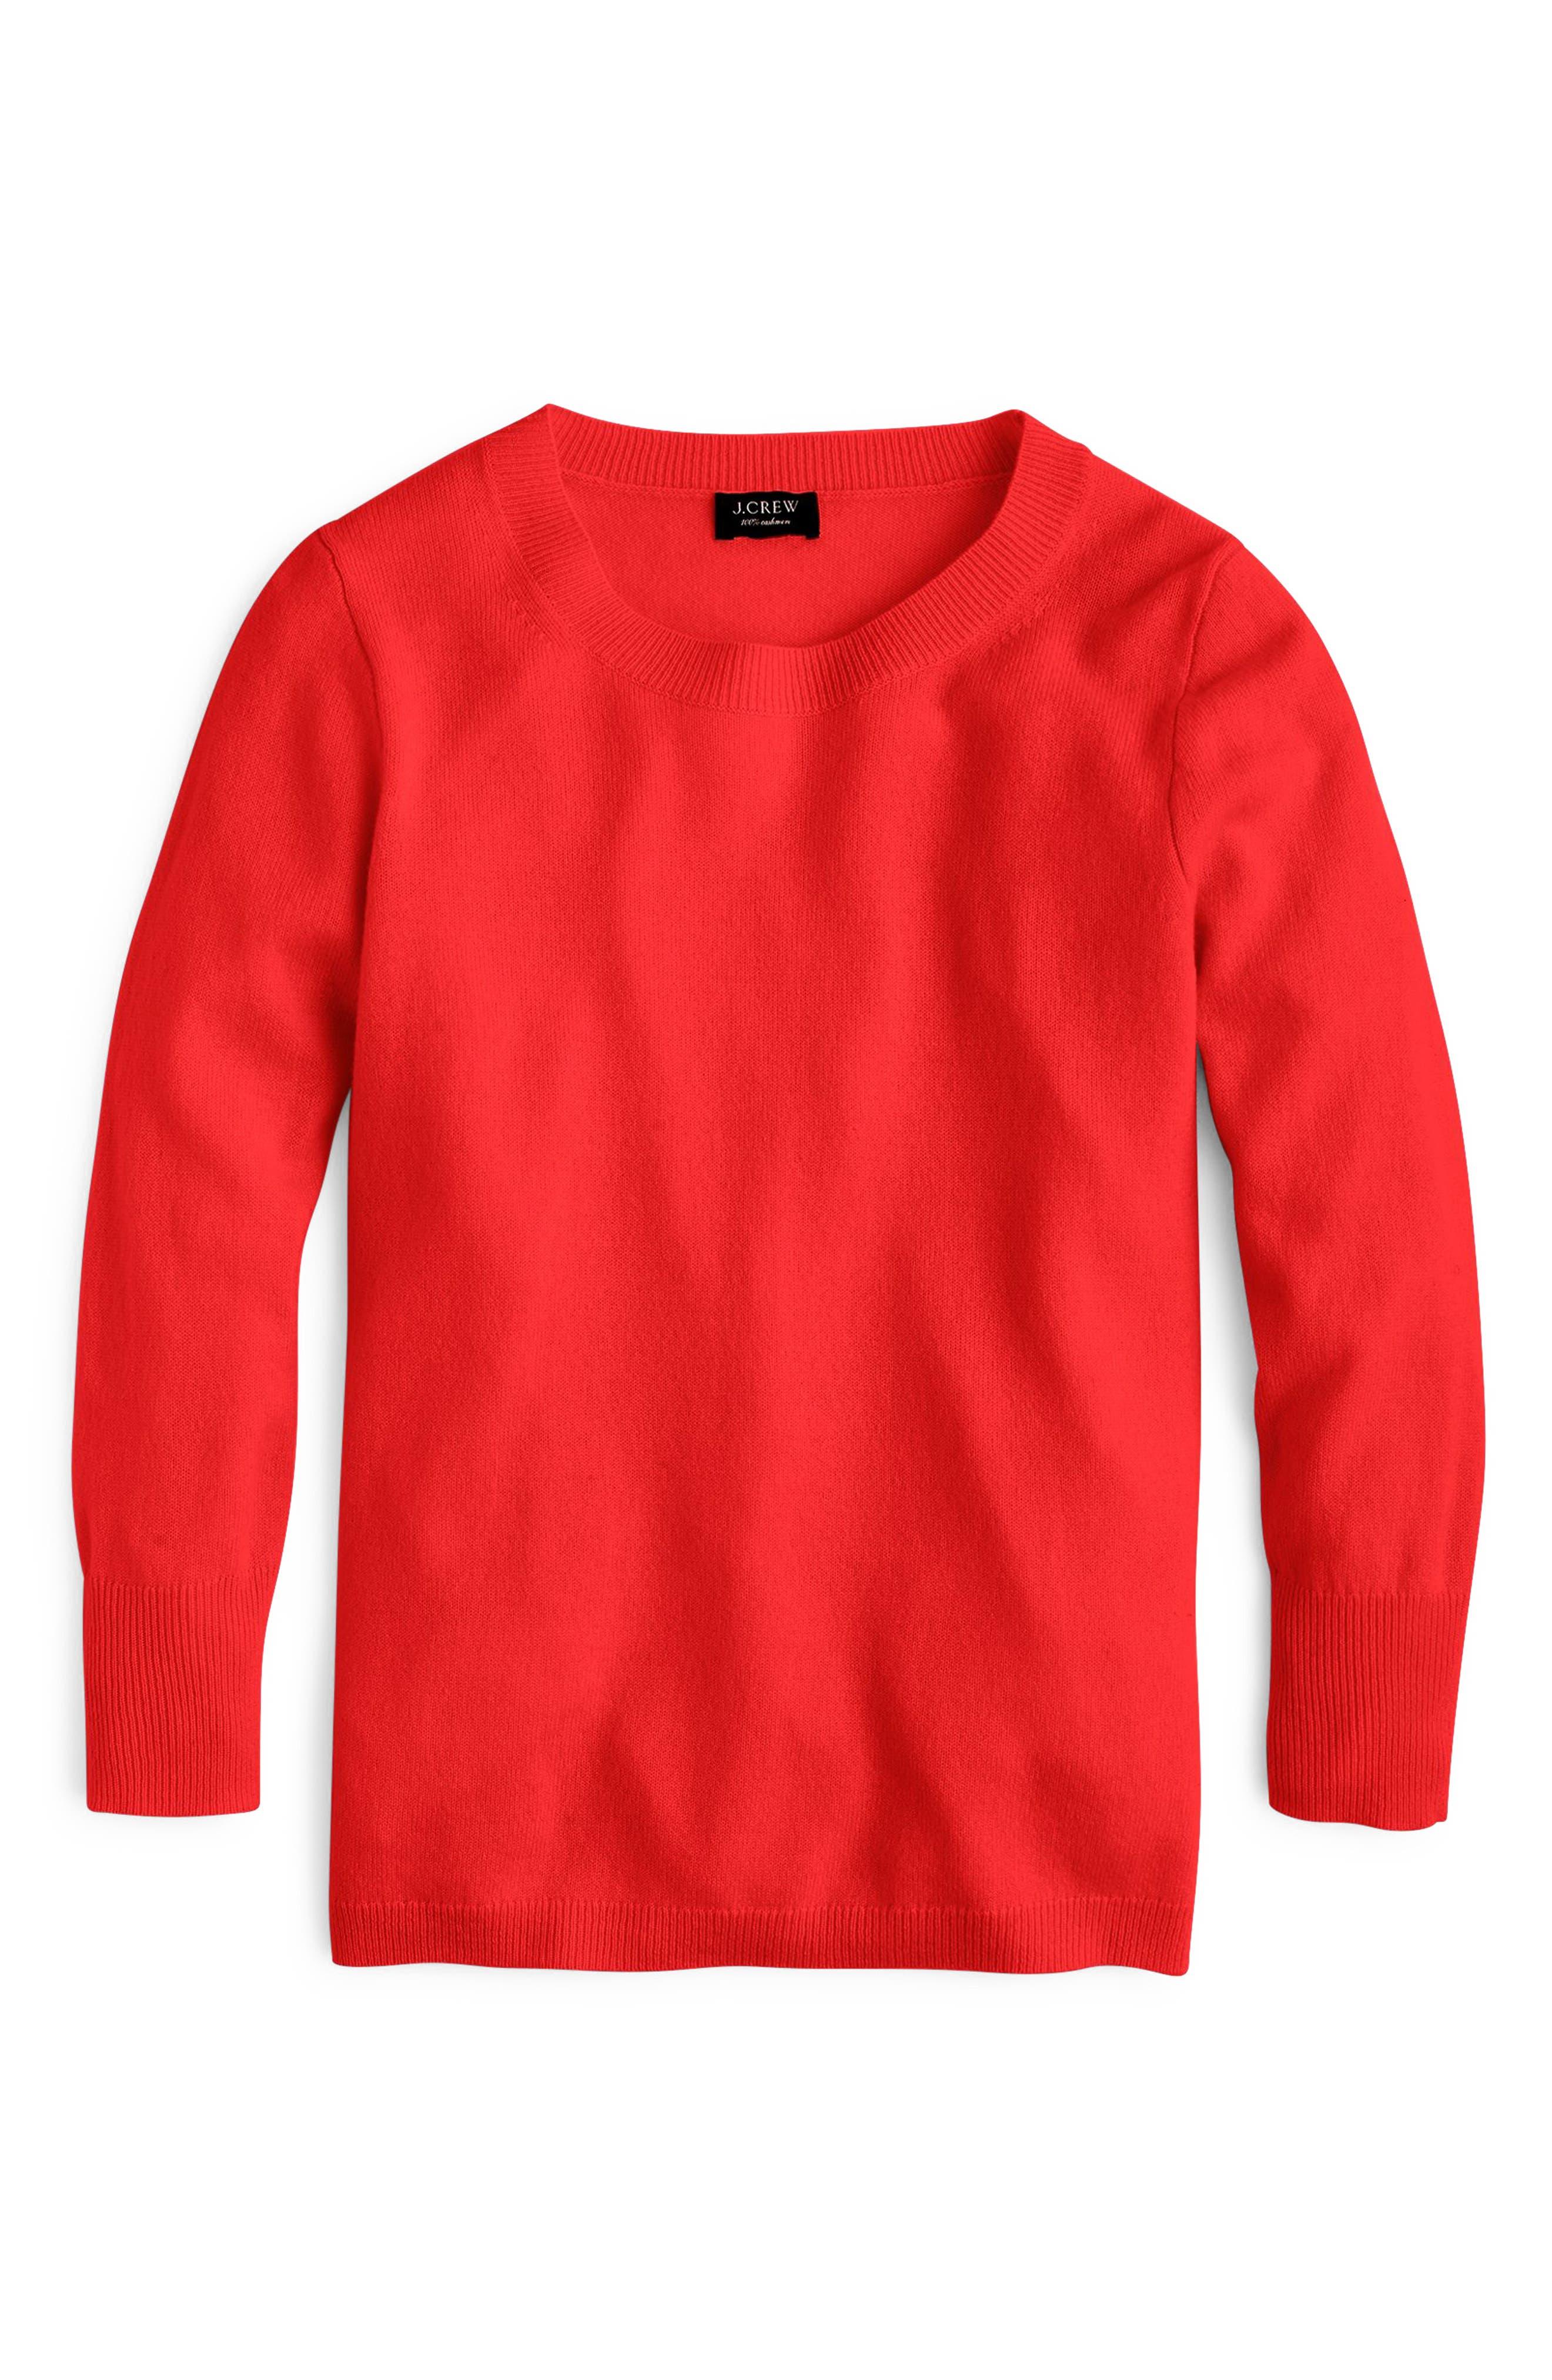 Crewneck Cashmere Sweater,                             Main thumbnail 1, color,                             BRIGHT CERISE